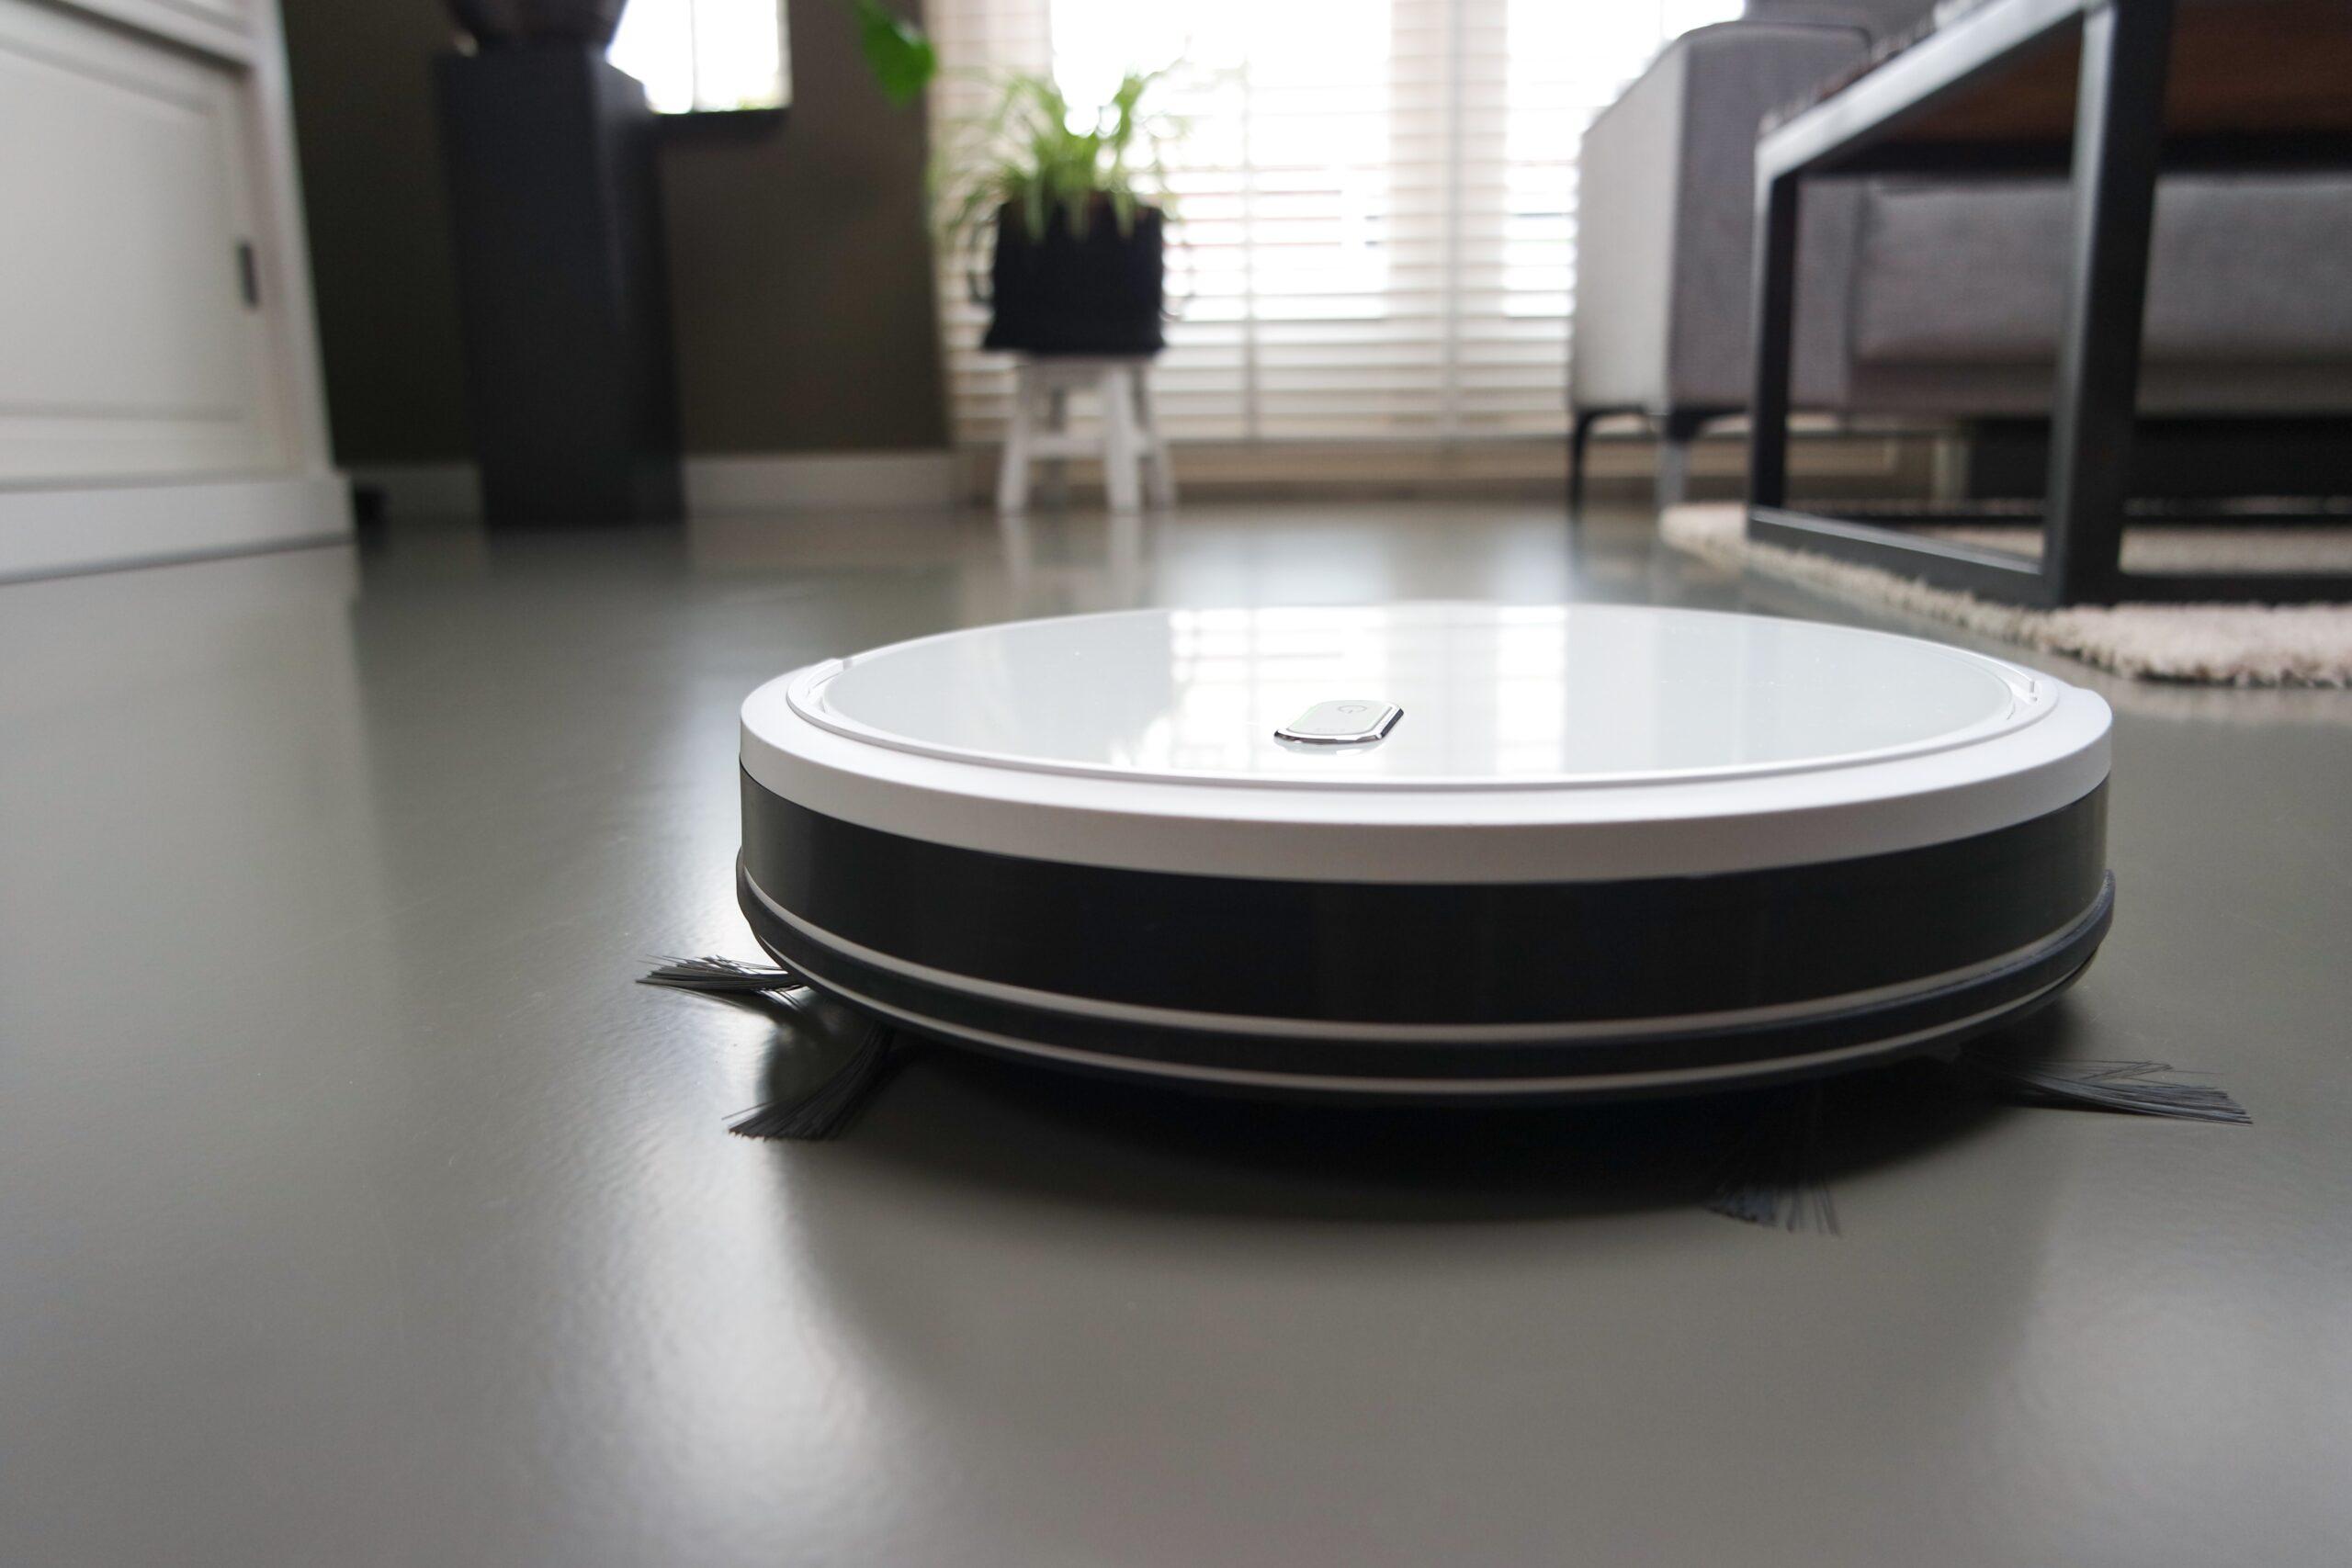 a white robot vacuum cleaner on the floor at home clean house concept everyday cleaning dusting t20 nLz7kP - Robot-Clean der biologische, universelle Duft Reiniger(Sandelholz) zum Mischen